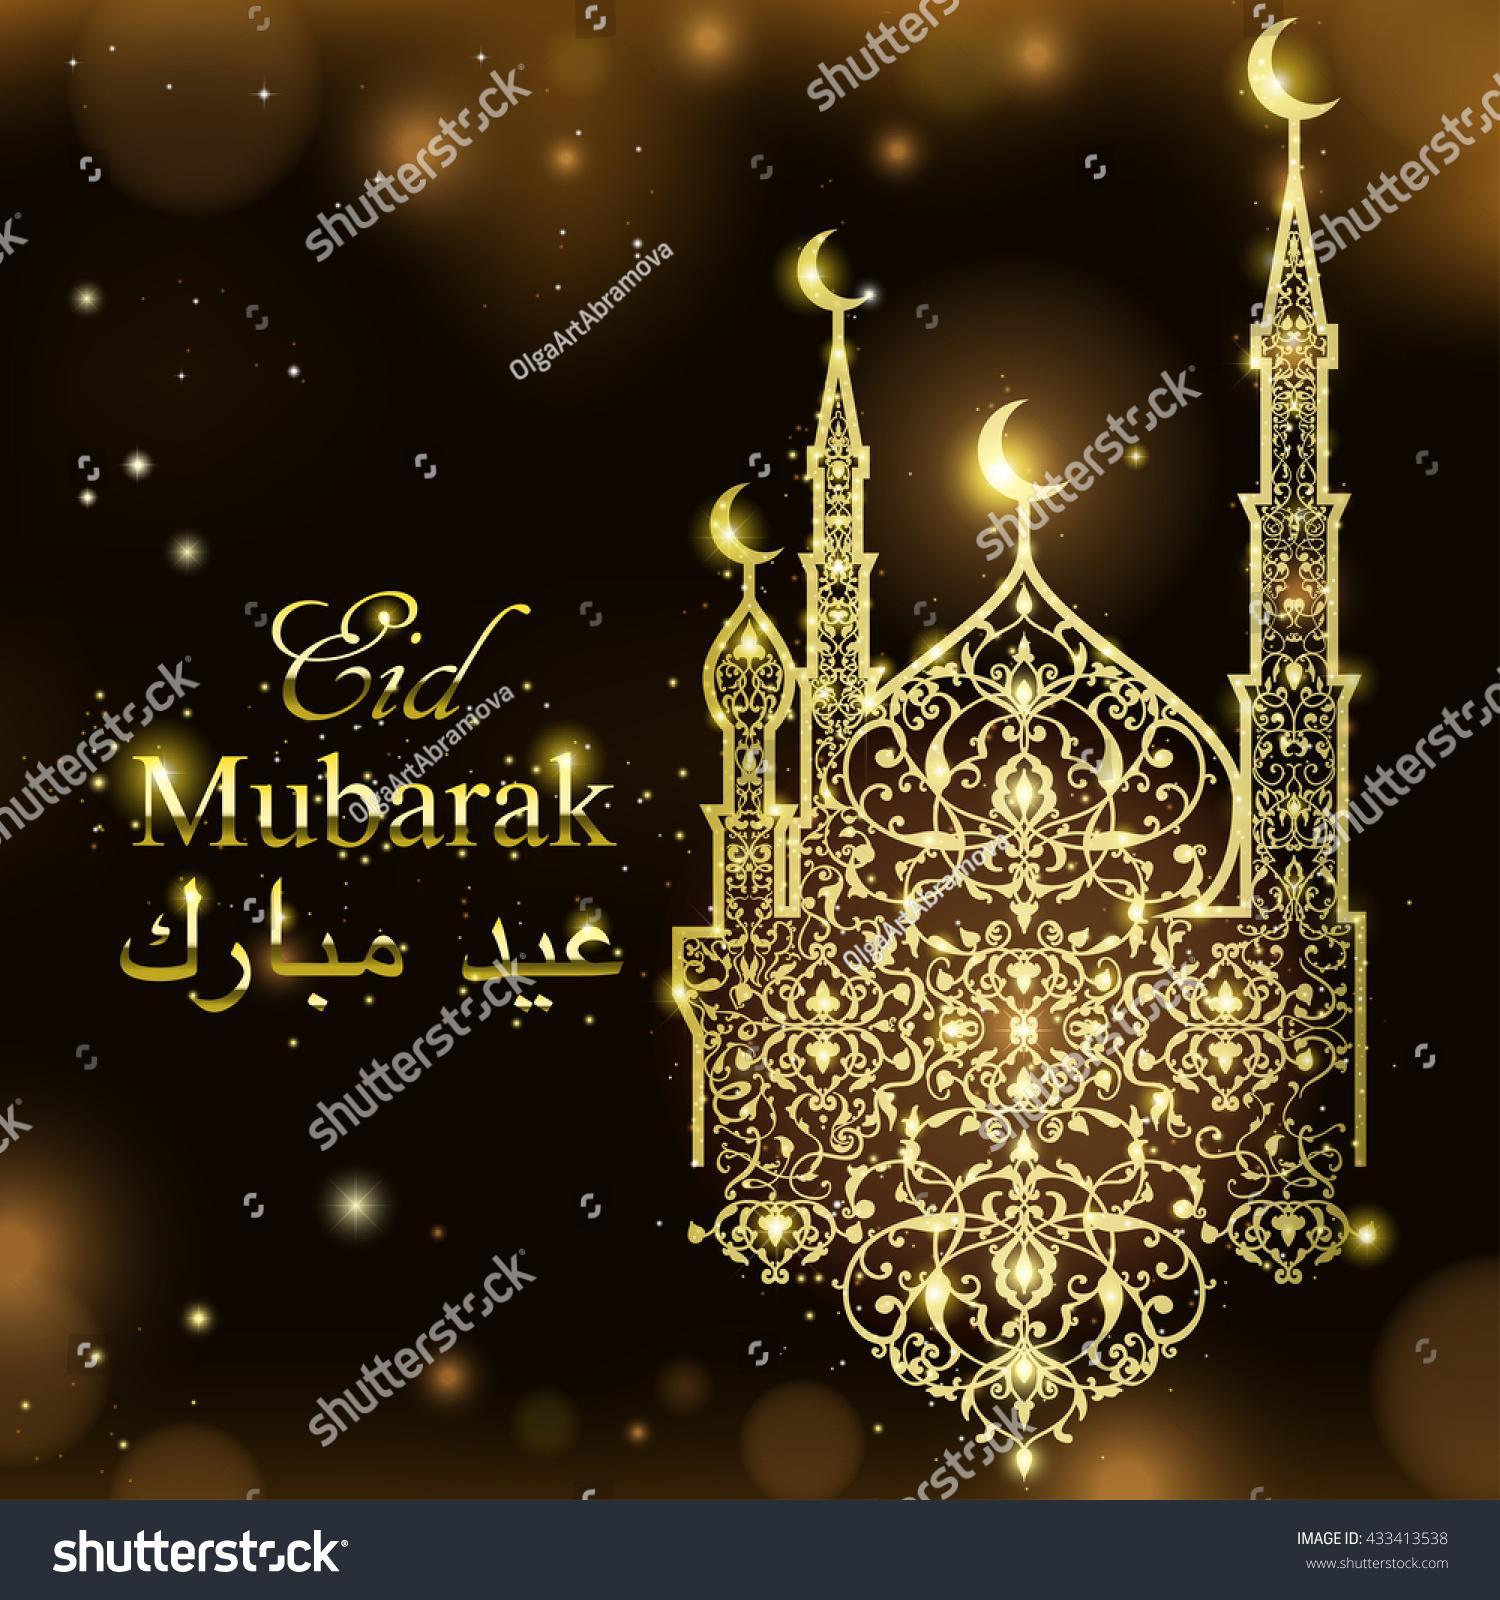 Must see Light Eid Al-Fitr Decorations - stock-vector-eid-mubarak-beautiful-mosque-on-sparkling-lights-and-stars-background-islamic-celebration-433413538  Trends_119729 .jpg